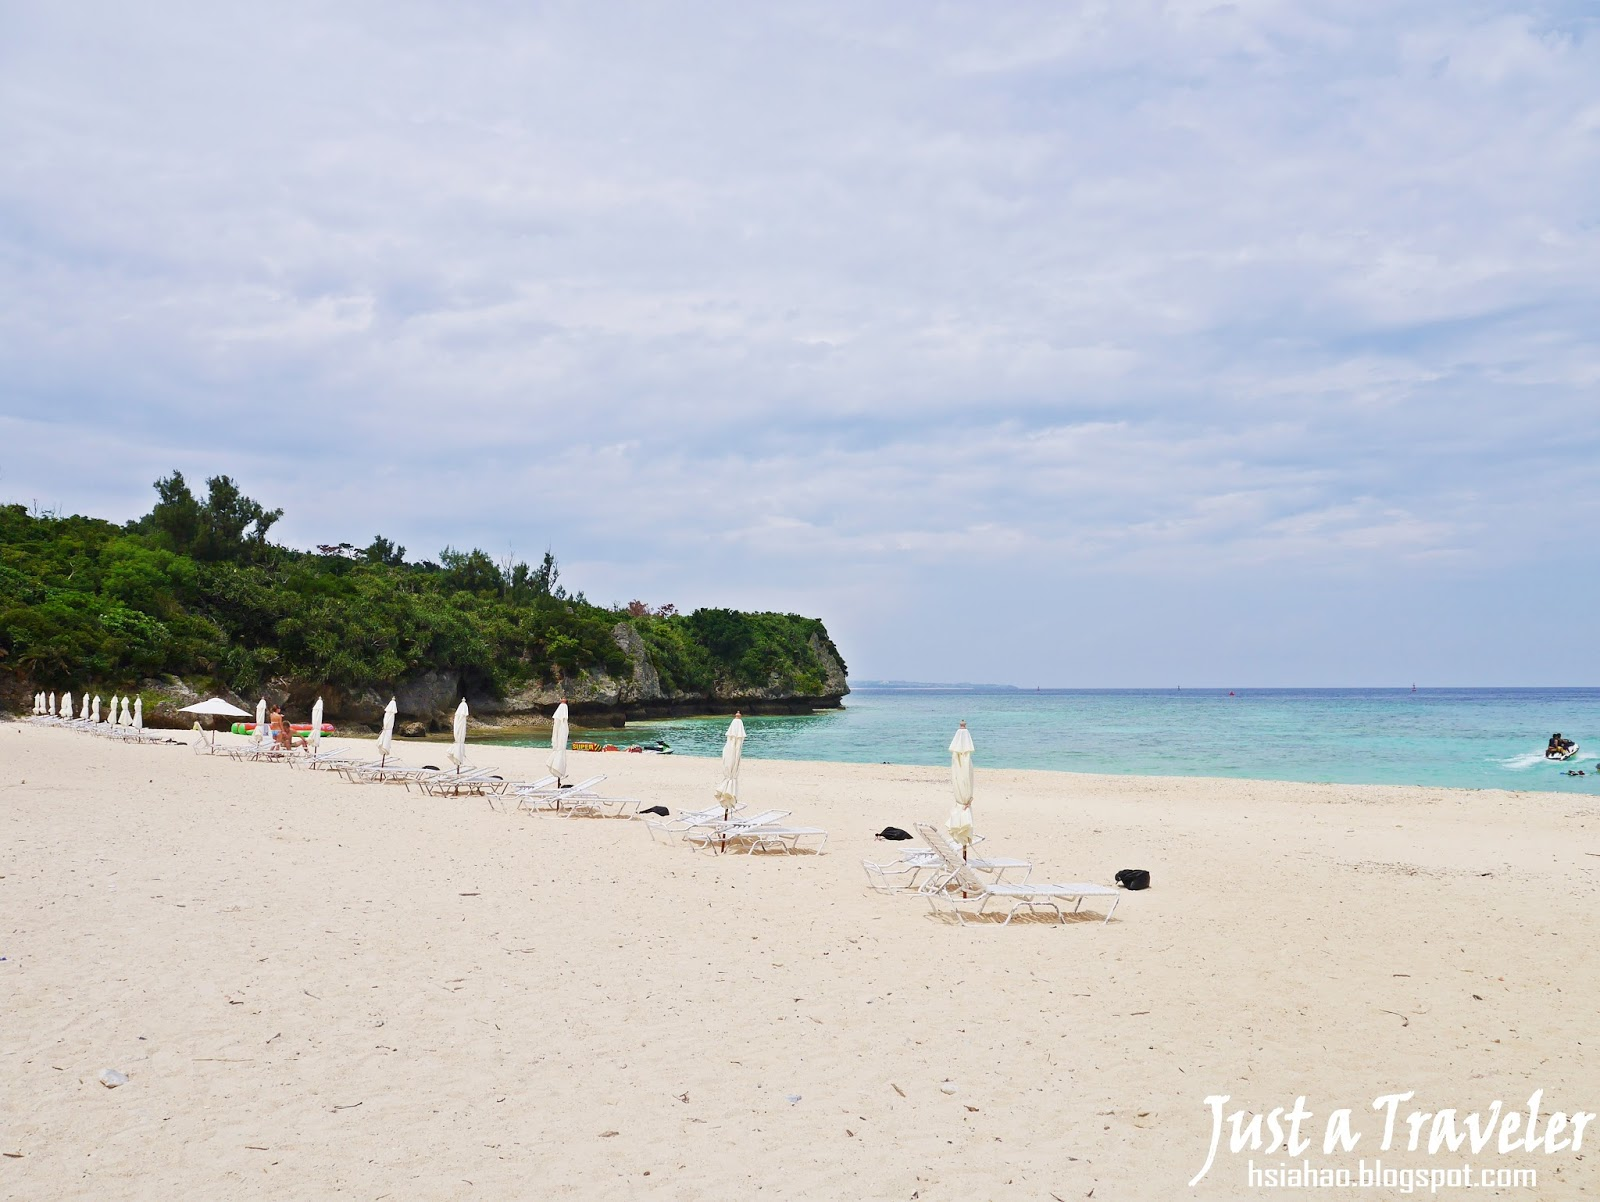 沖繩-景點-瀨底島-瀨底海灘-瀬底ビーチ-Sesoko-Beach-推薦-自由行-旅遊-Okinawa